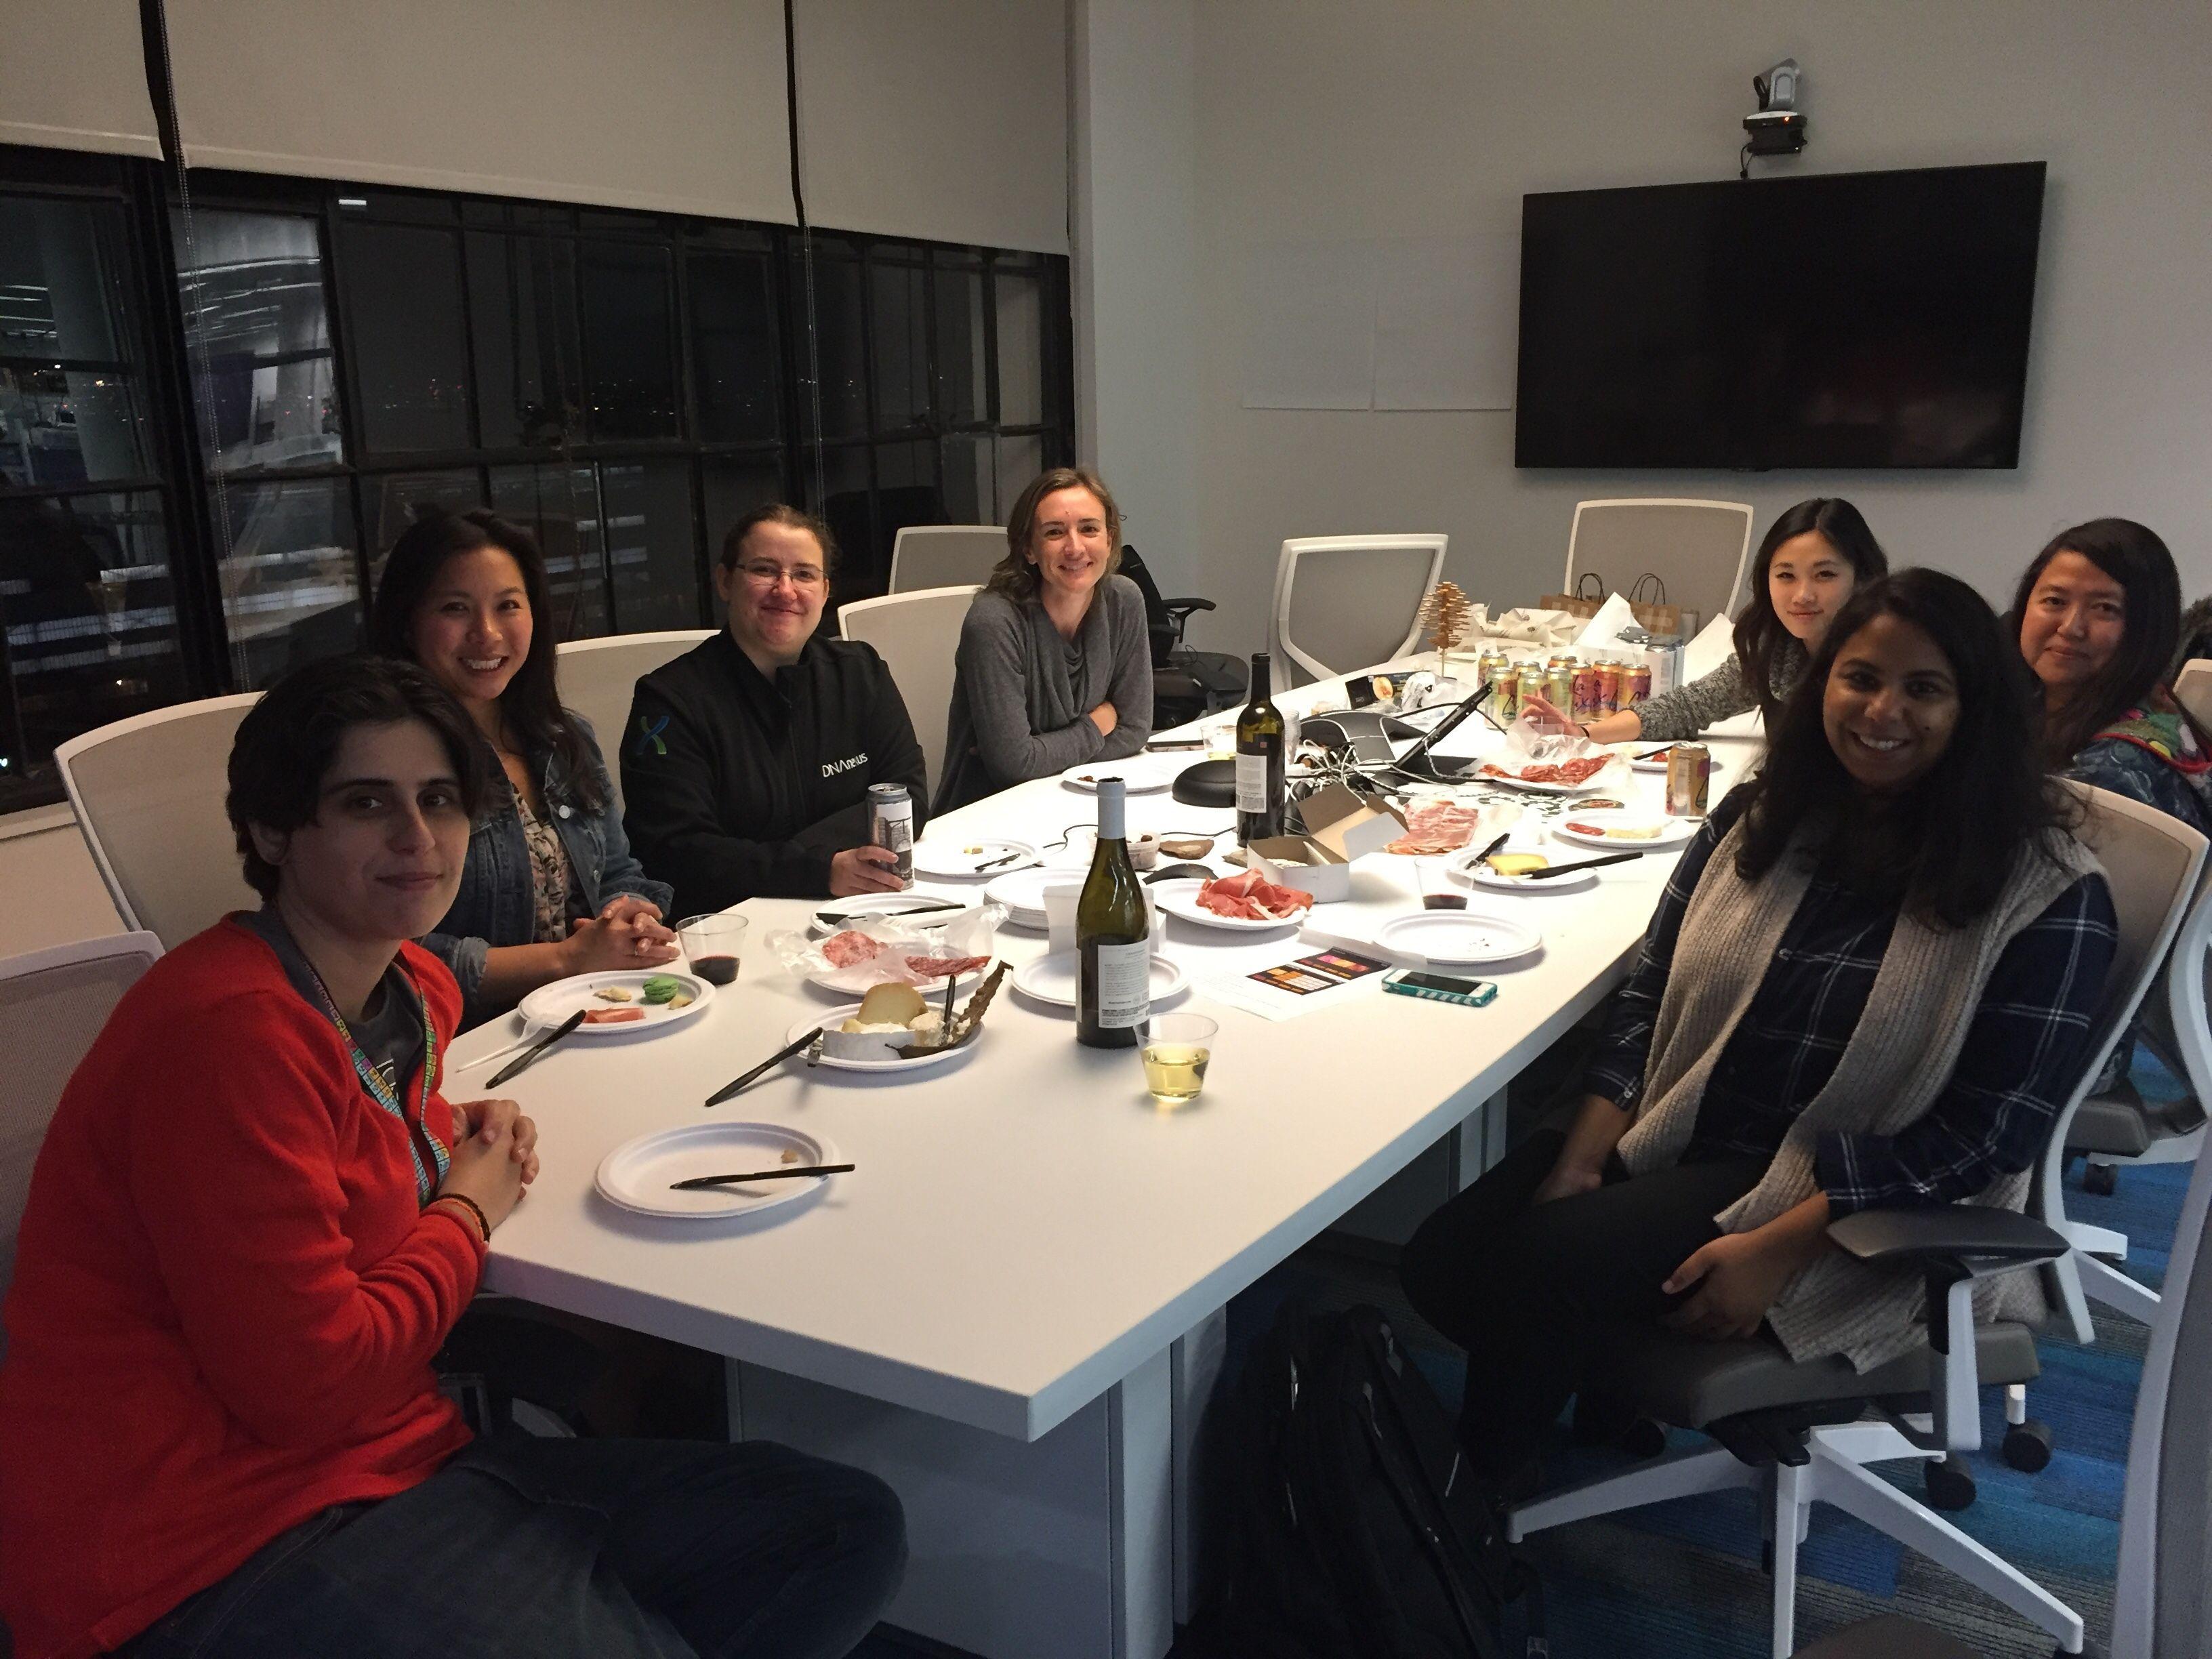 Boston-area Women's Bioinformatics Meetup